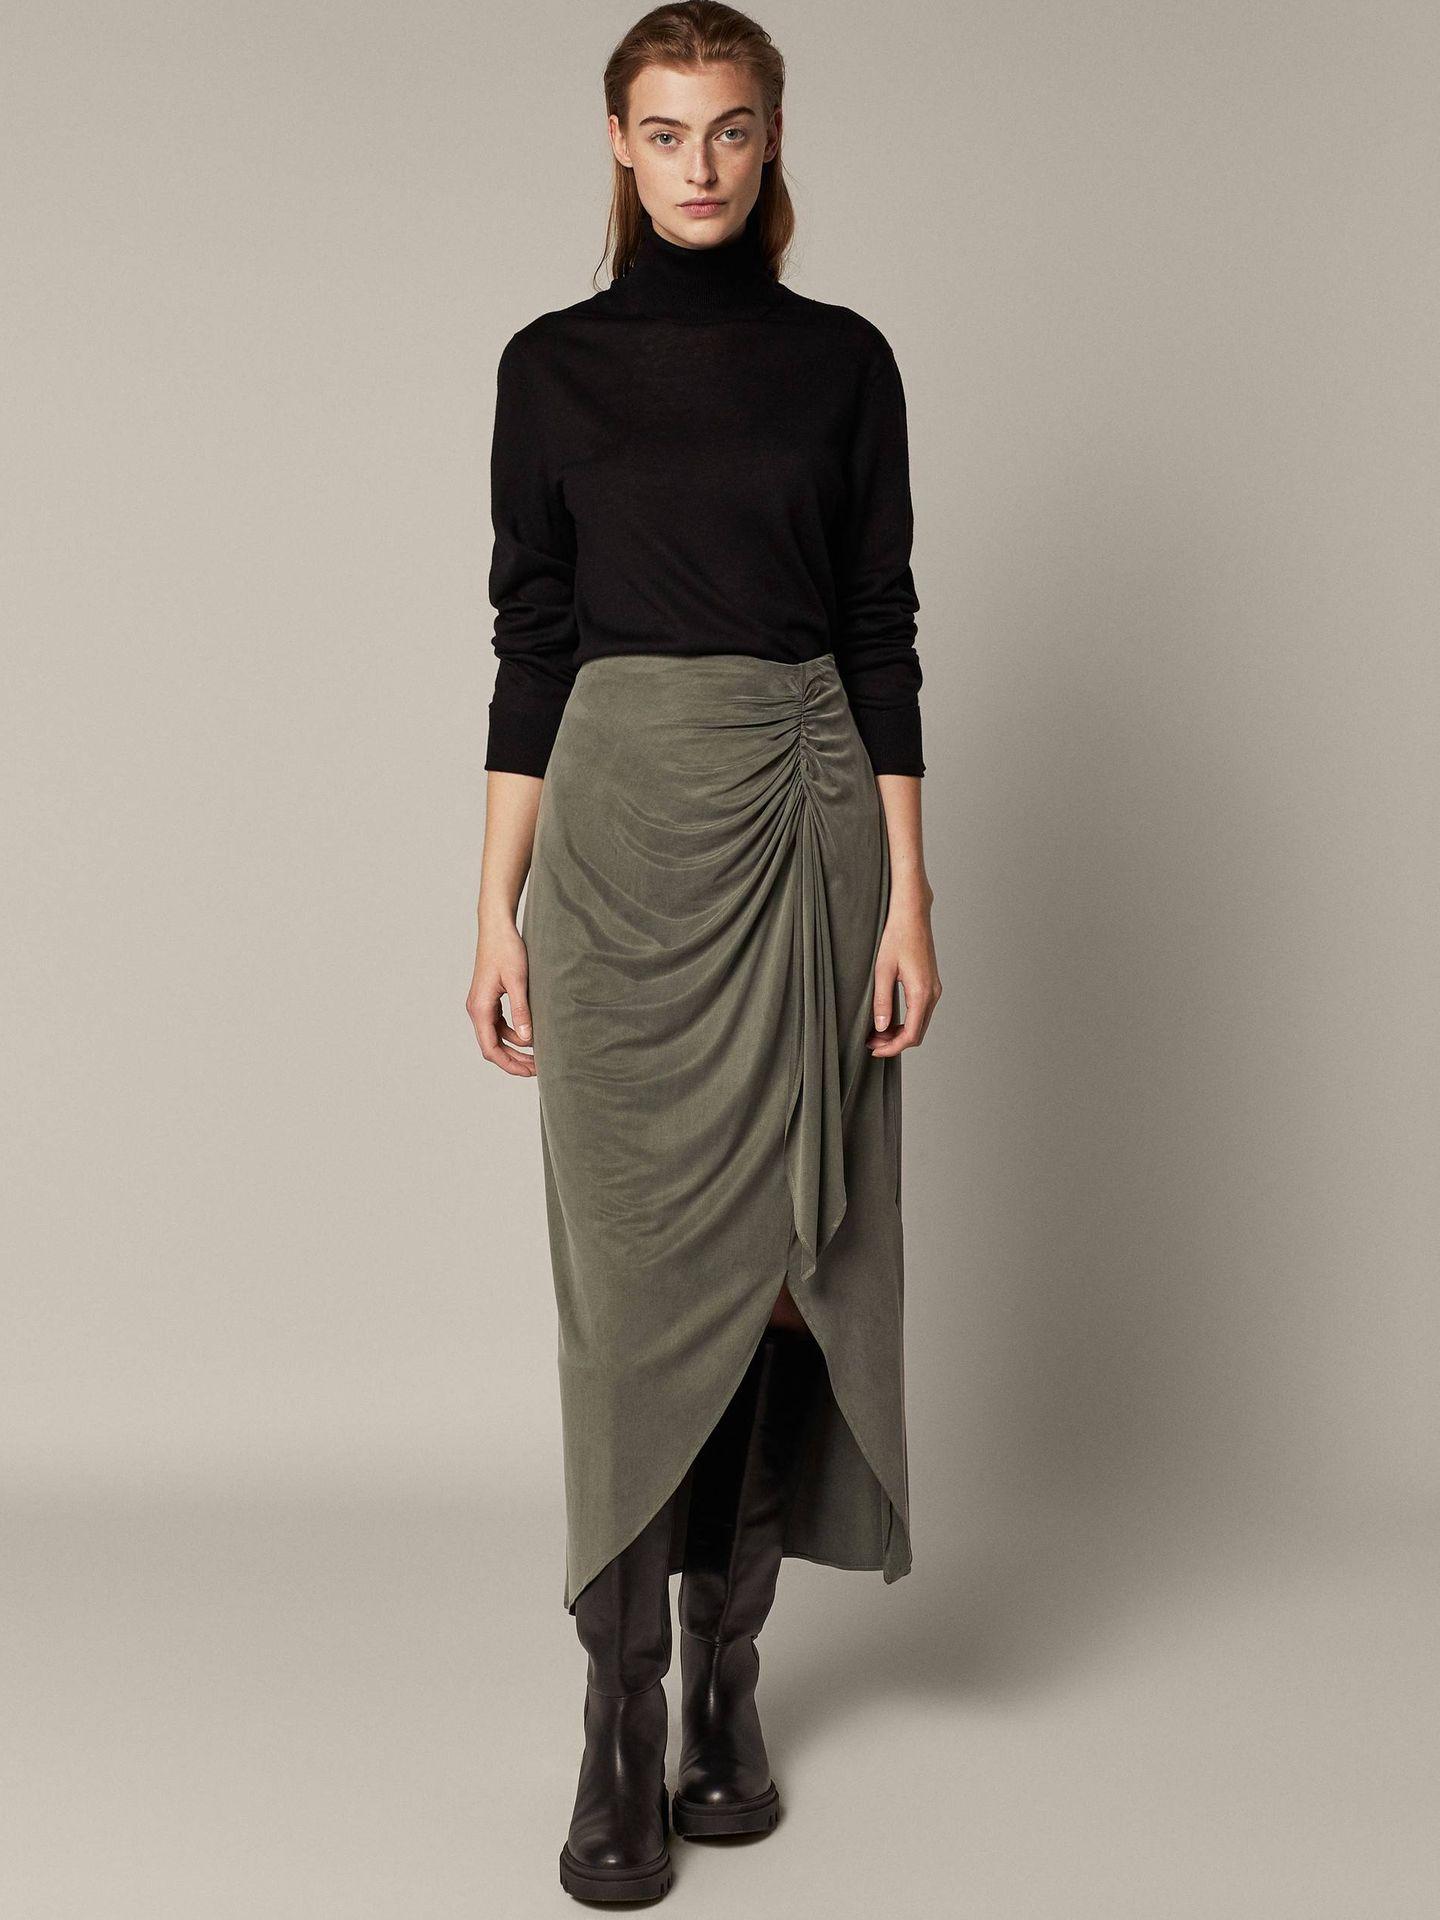 Falda de cupro de Massimo Dutti. (Cortesía)